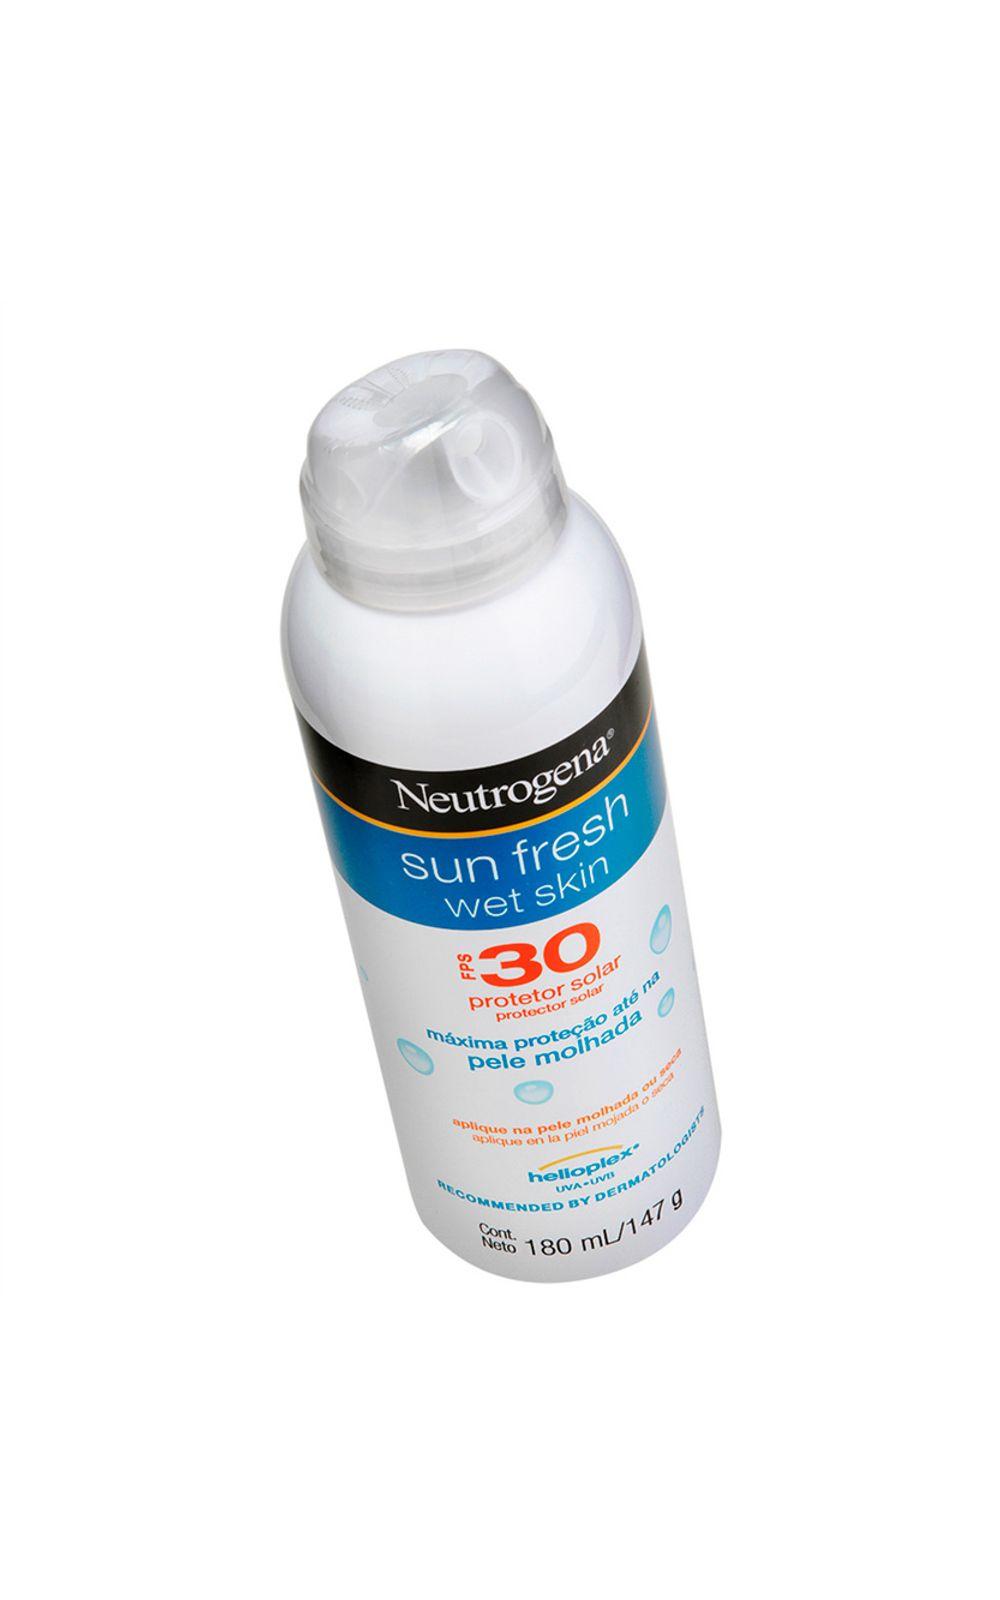 Foto 3 - Protetor Solar Neutrogena Sun Fresh Wet Skin FPS 30 - 180ml